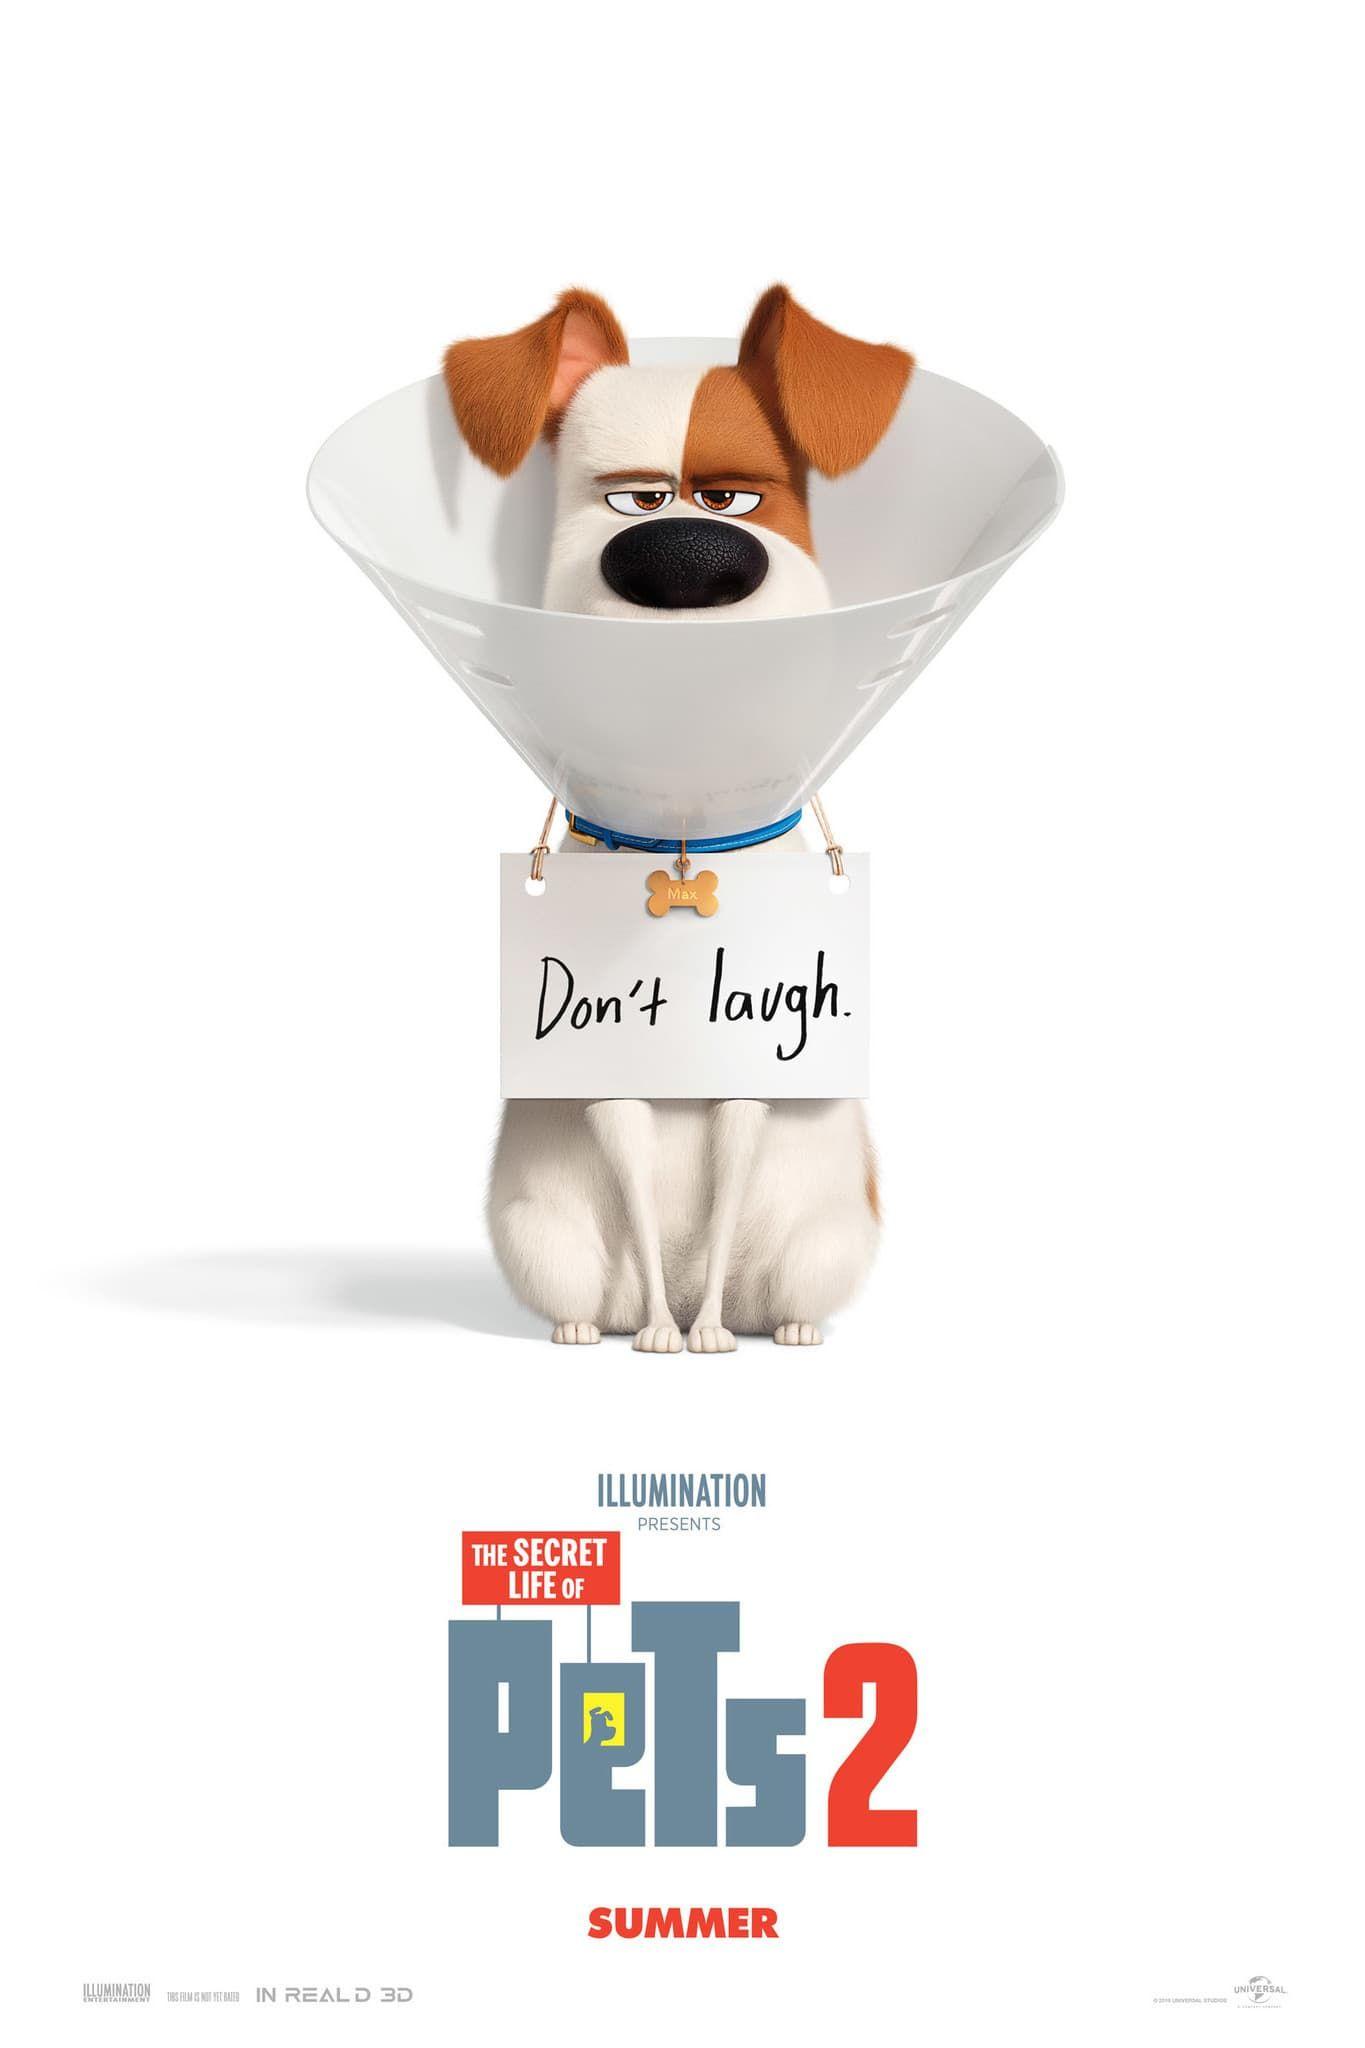 The Secret Life Of Pets 2 Filme Cmplet Dublad Dwnlad Secret Life Of Pets Secret Life Full Movies Download